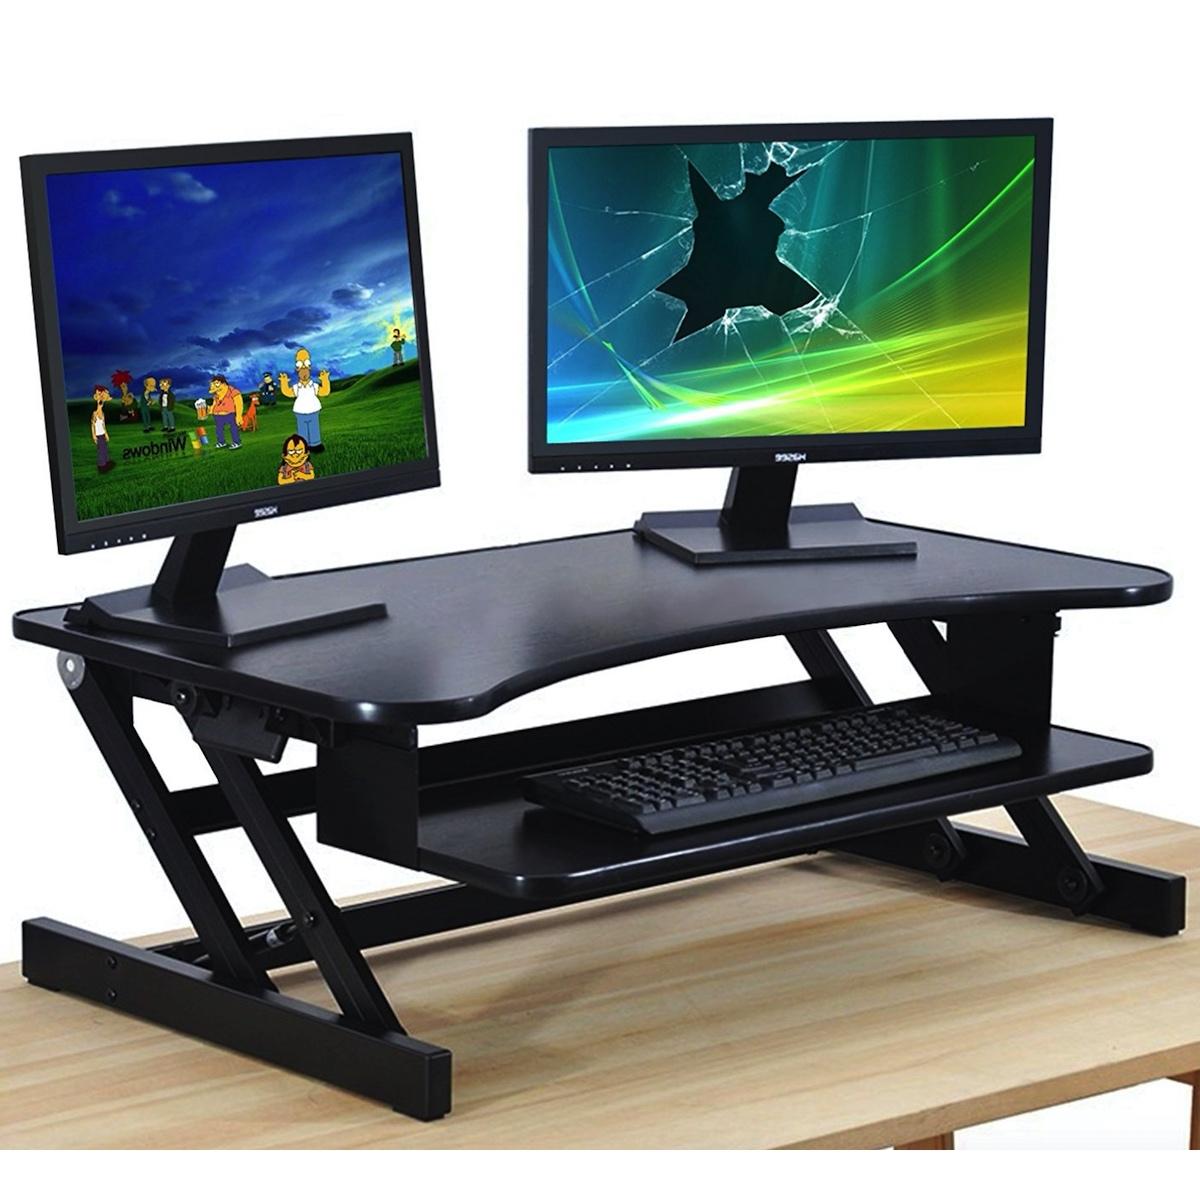 Standing Desk - the DeskRiser - Height Adjustable | Heavy ...